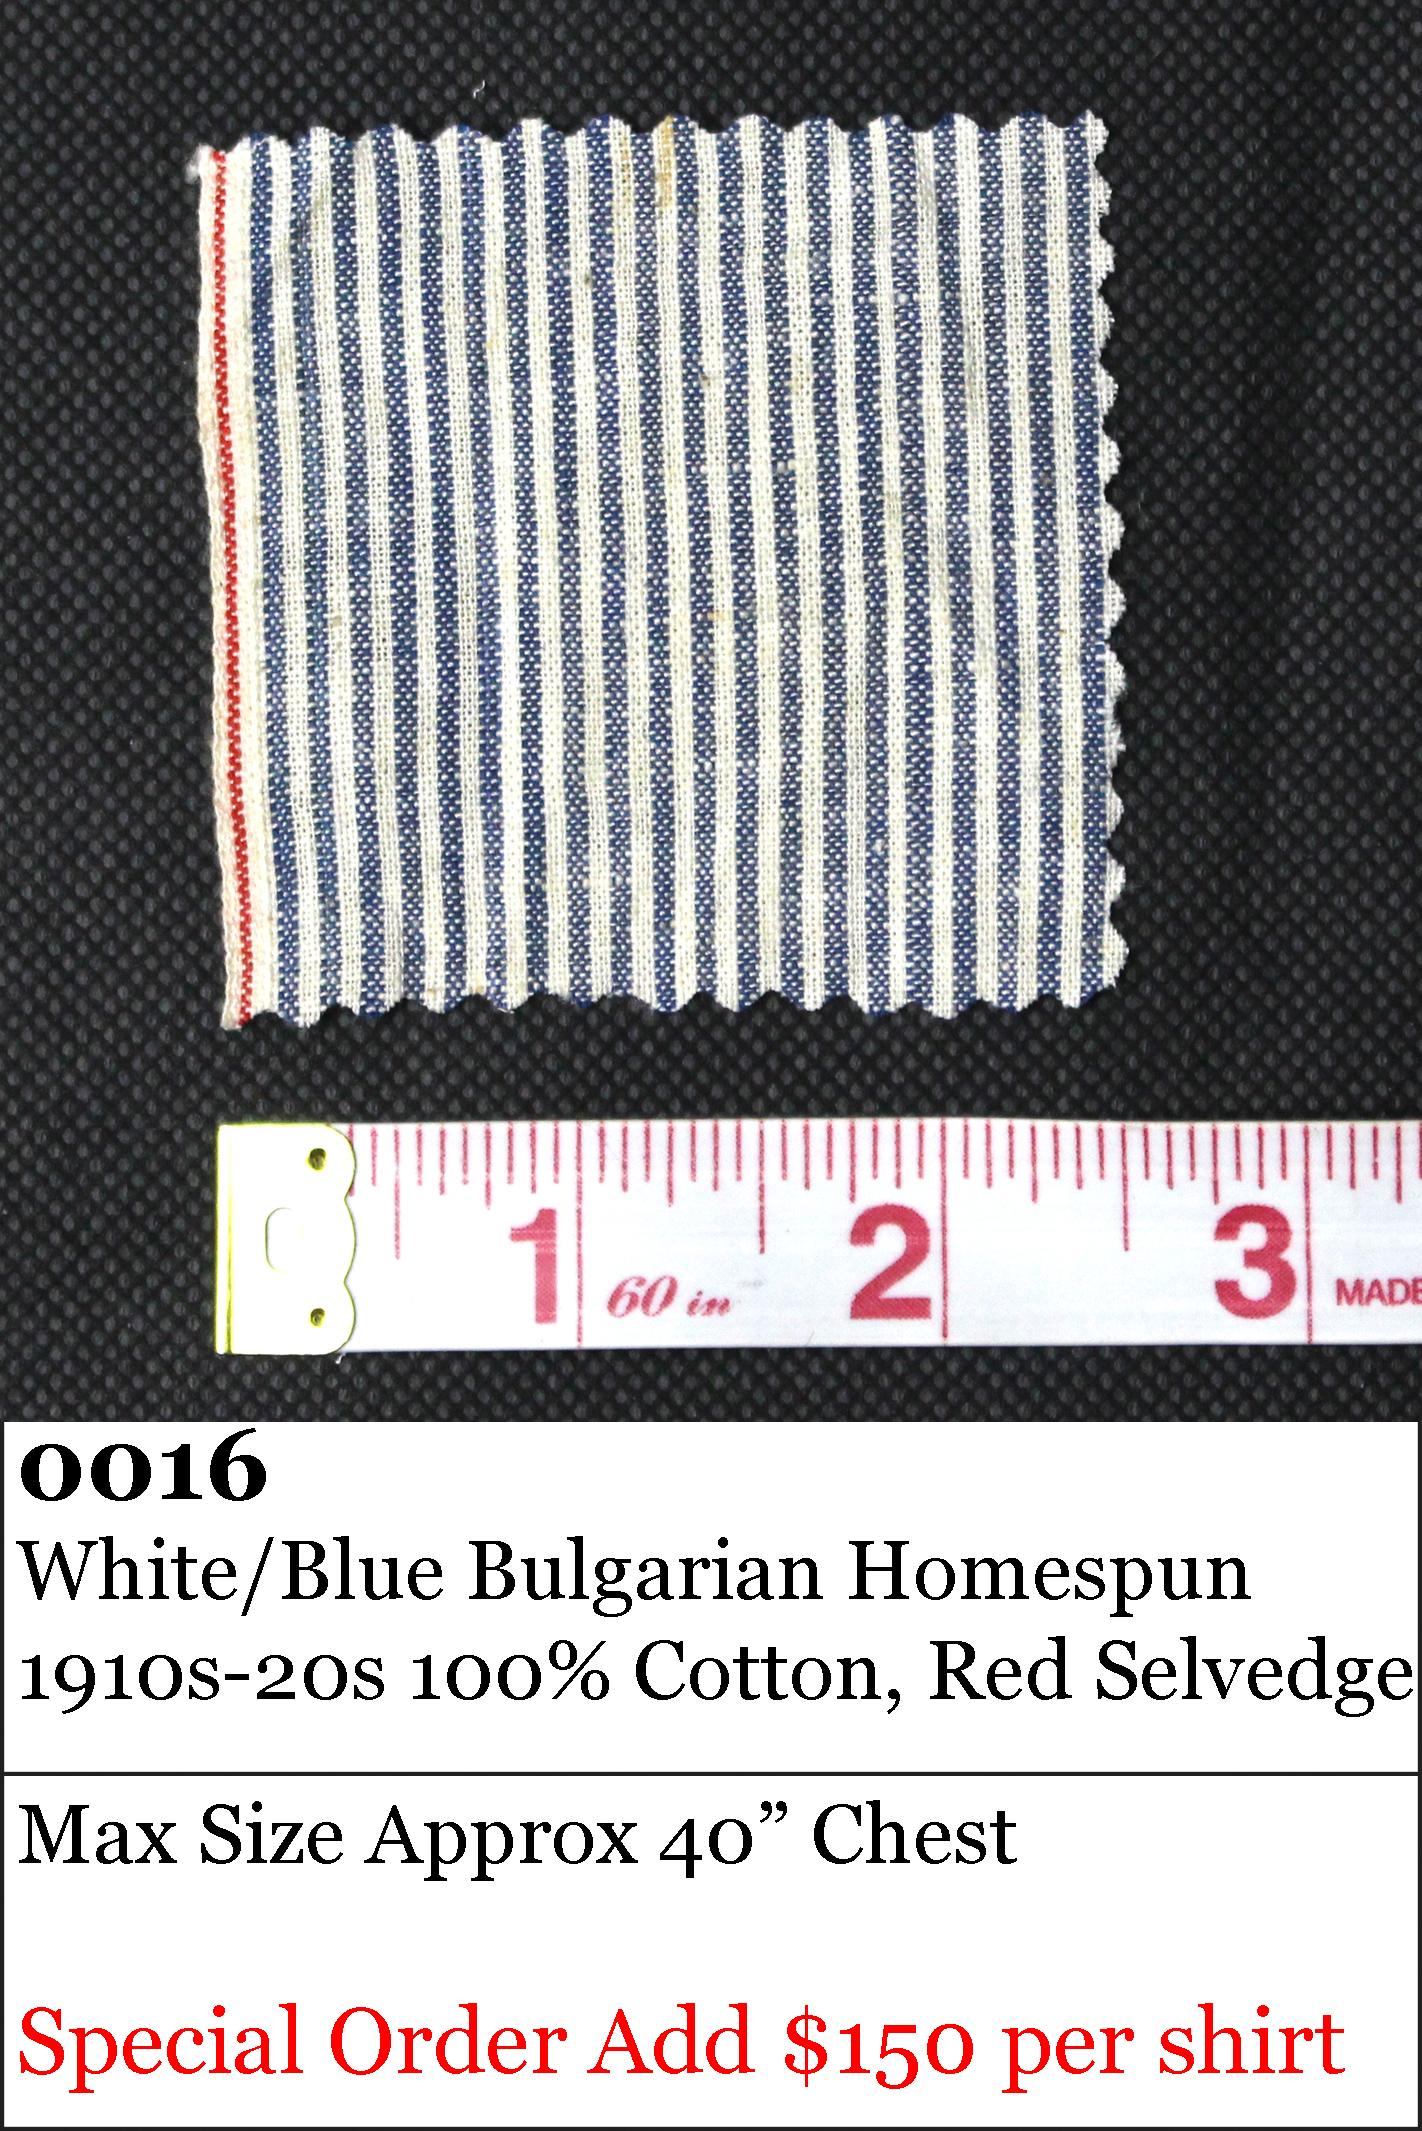 Fabric0016.jpg